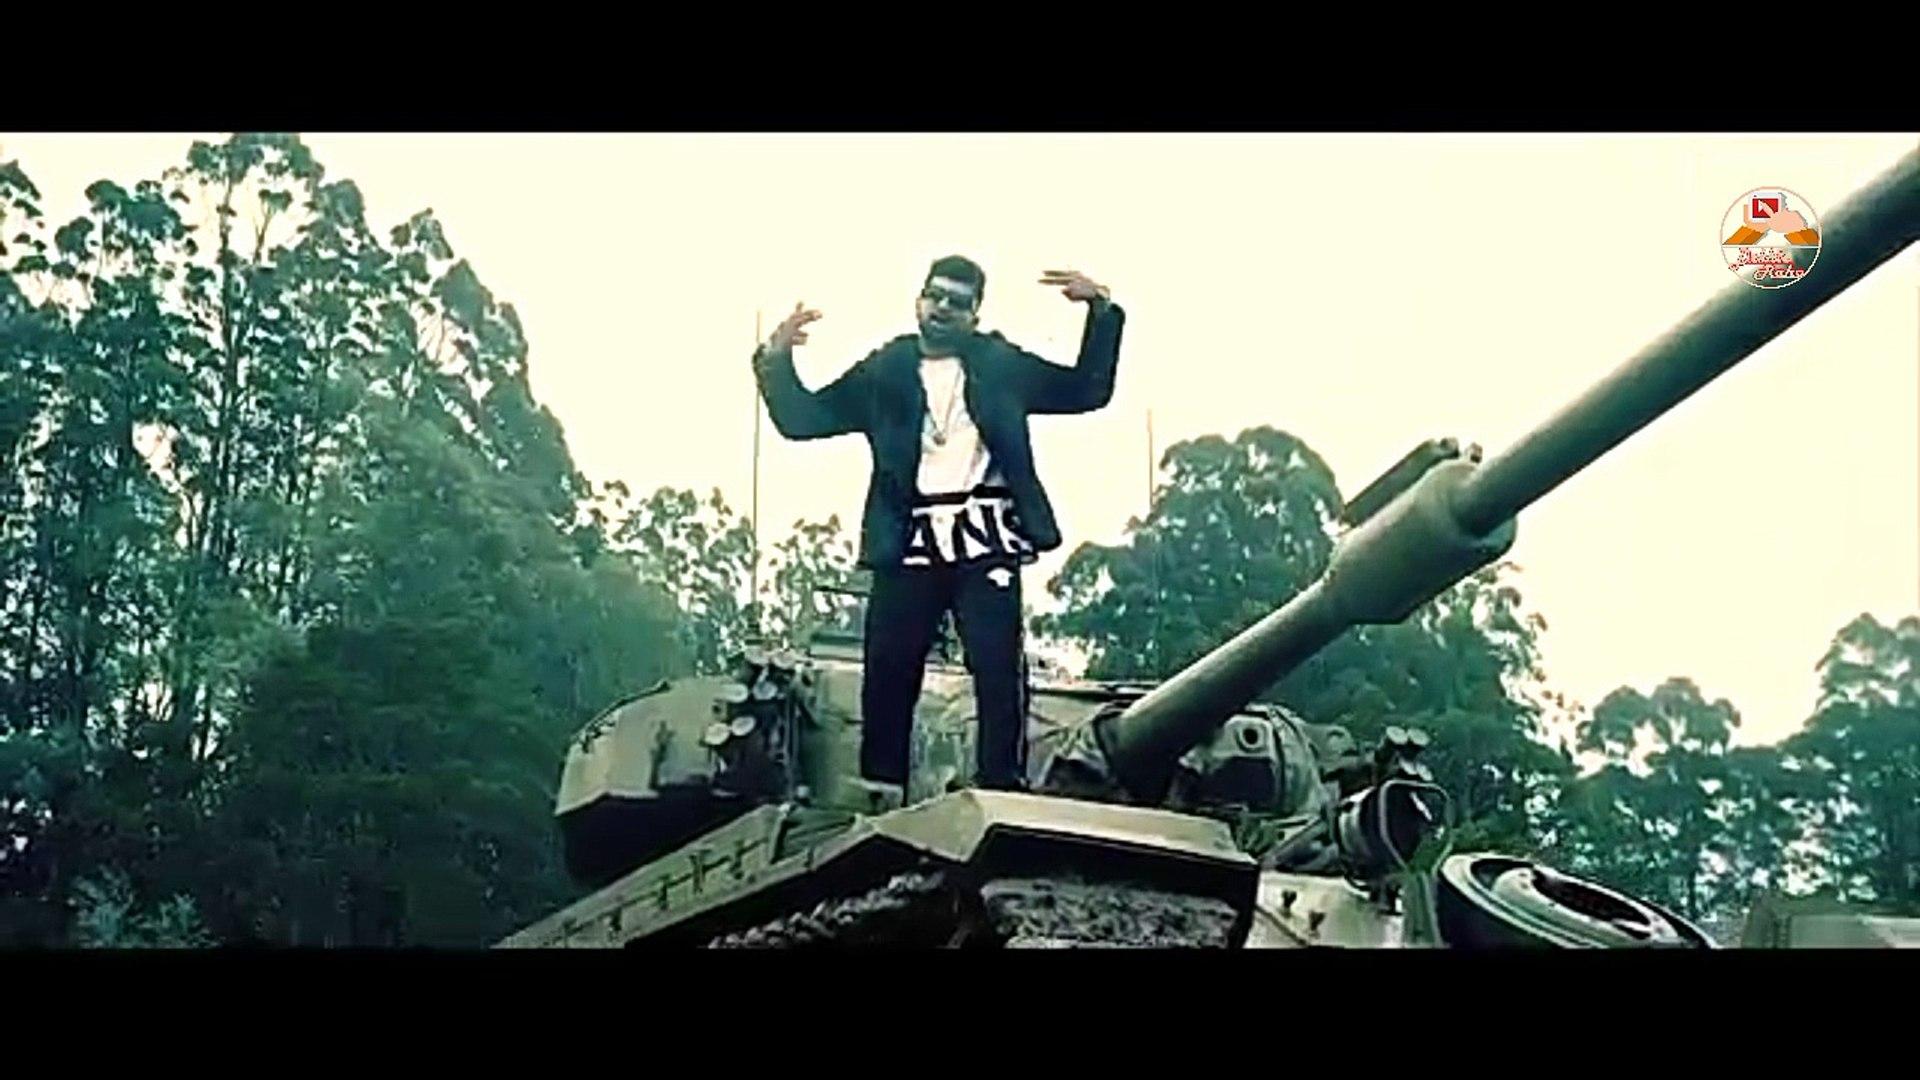 Russian Tank   Khush Romana feat. Sidhu Moose Wala   BYG BYRD   Latest Punjabi Song 2018 whatsapp st